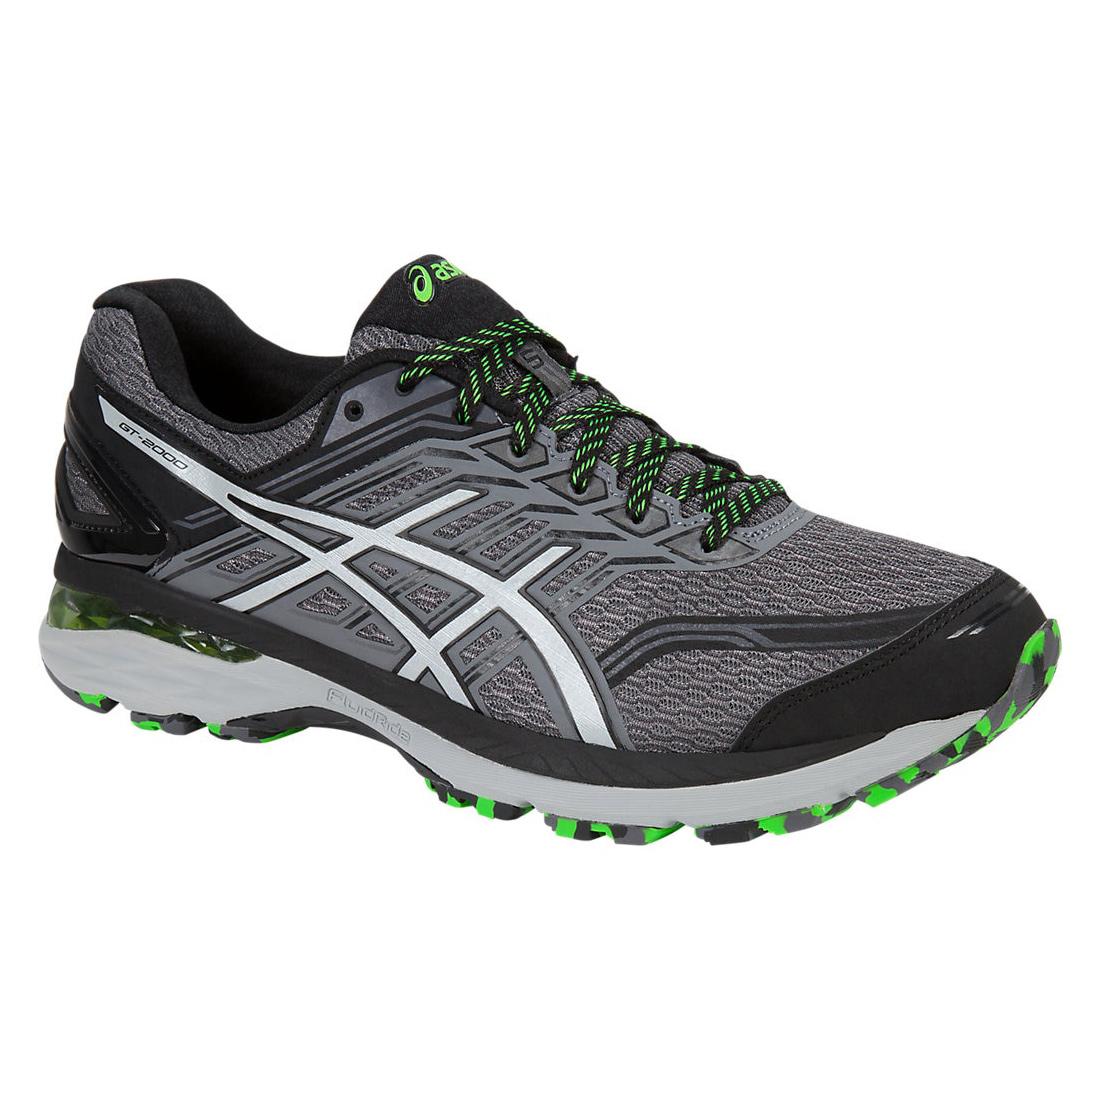 Image of Asics GT-2000 5 Trail - Herren Jogging Trail Running Schuhe - T712N-9796 grau/grün